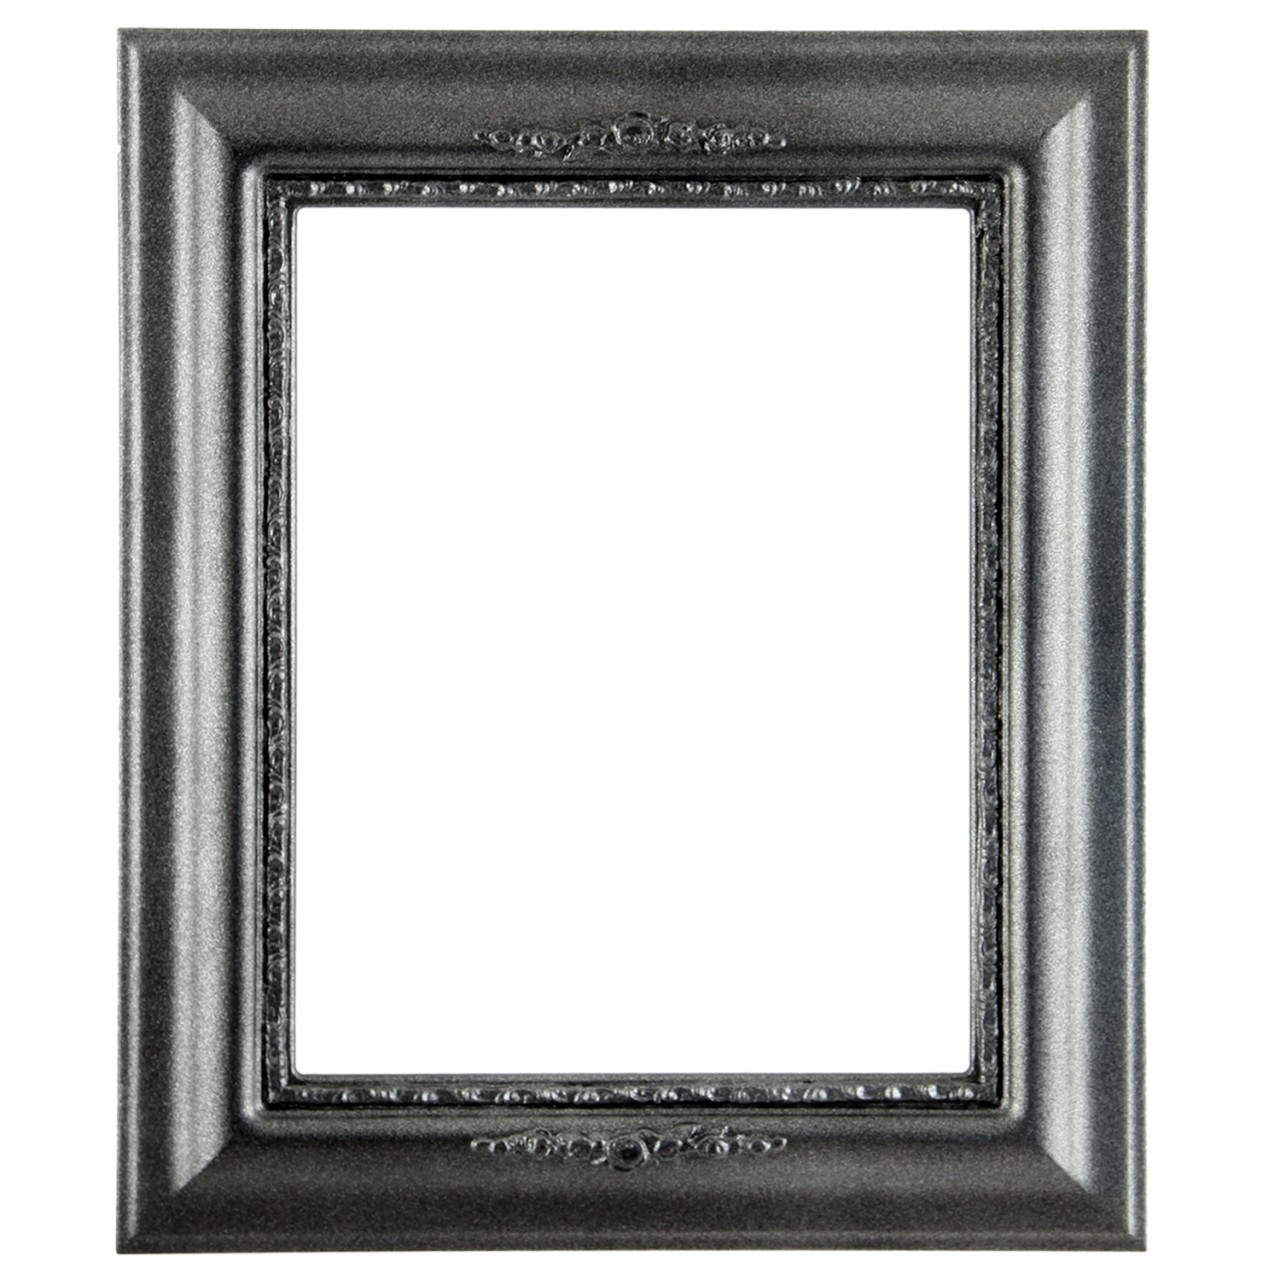 Rectangle Frame In Black Silver Finish Black Wooden Picture Frames